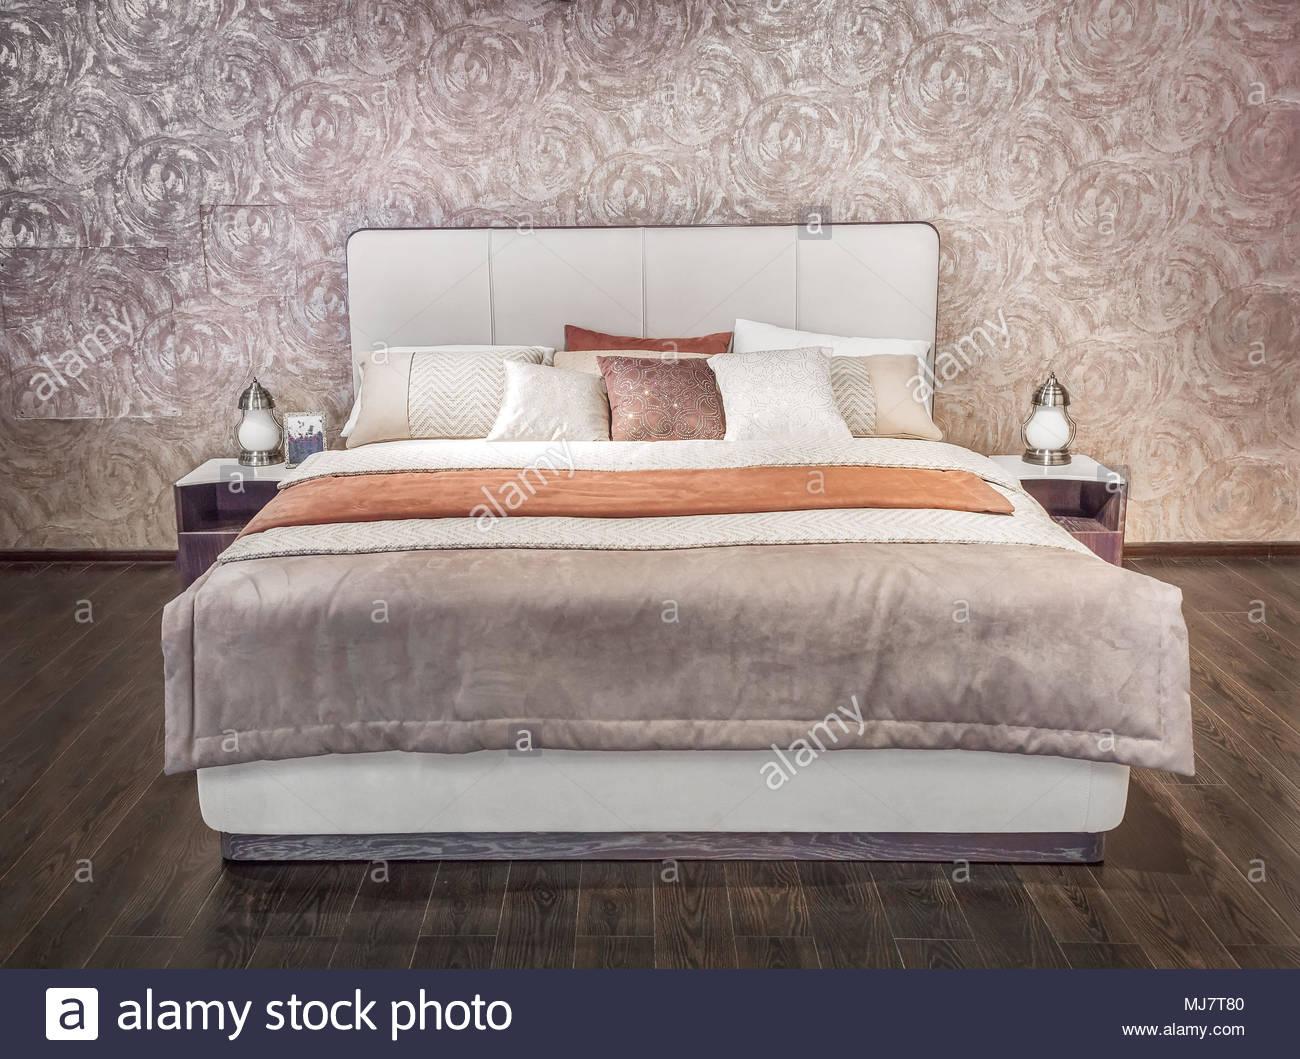 Full Size of Modernes Bett Luxus Grau Beige Mbel Mit Gemusterter Bettwsche Mädchen Vintage Niedrig Betten Berlin Skandinavisch Kiefer 90x200 140x200 Stauraum Ruf Hülsta Bett Modernes Bett